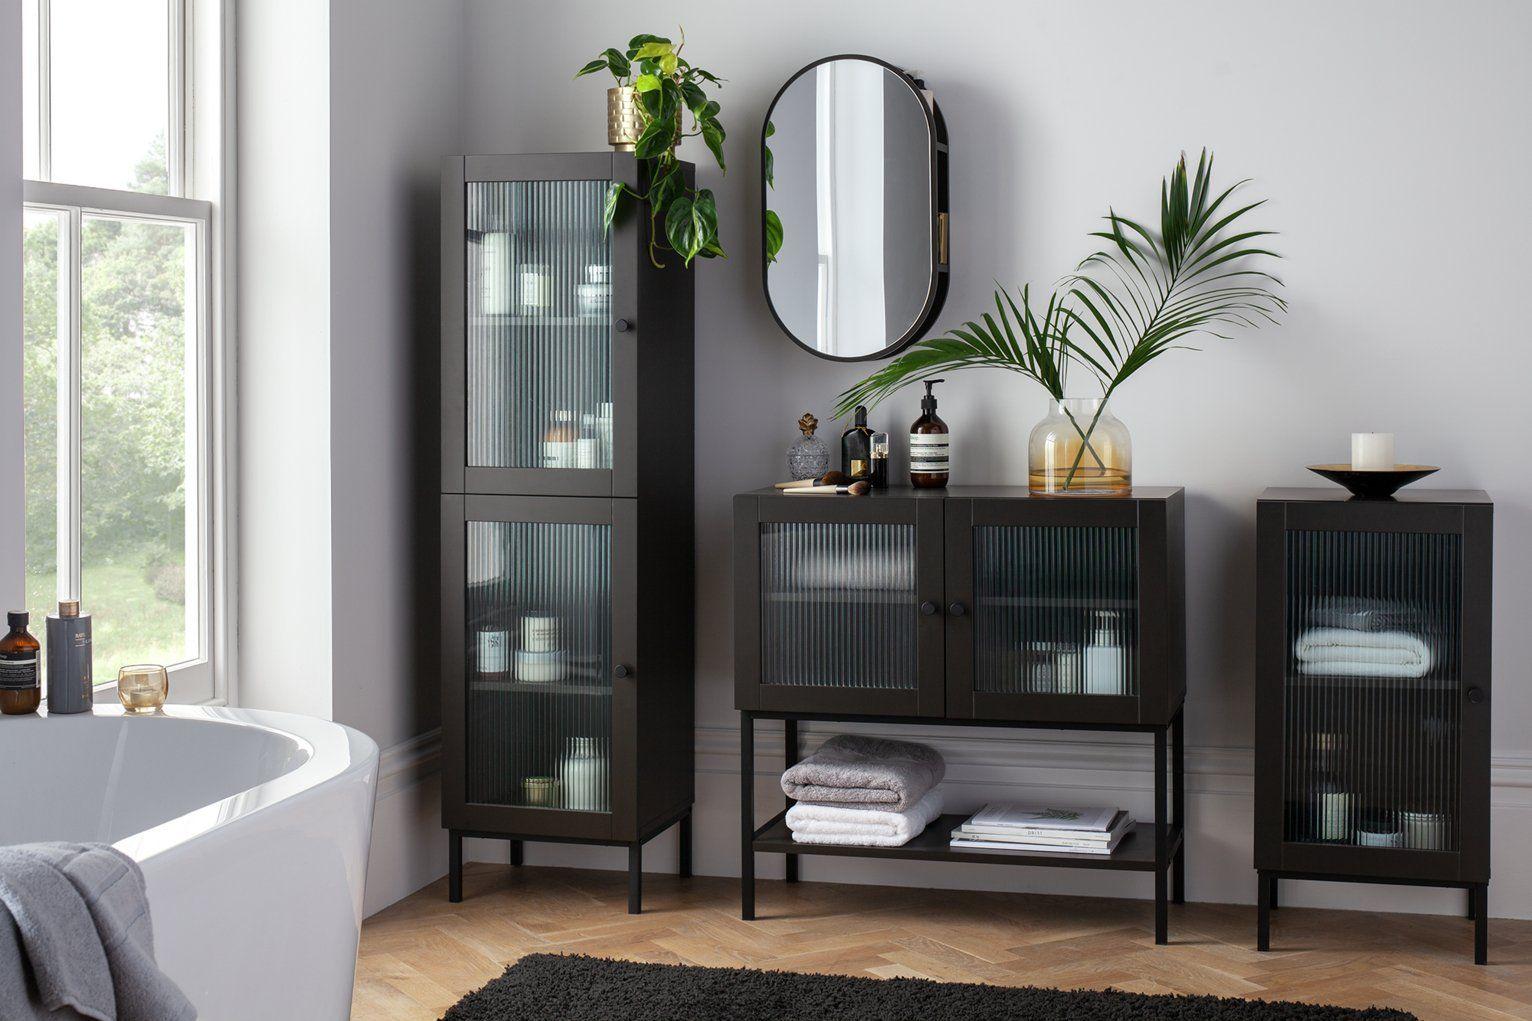 41+ Free standing bathroom cabinets habitat diy